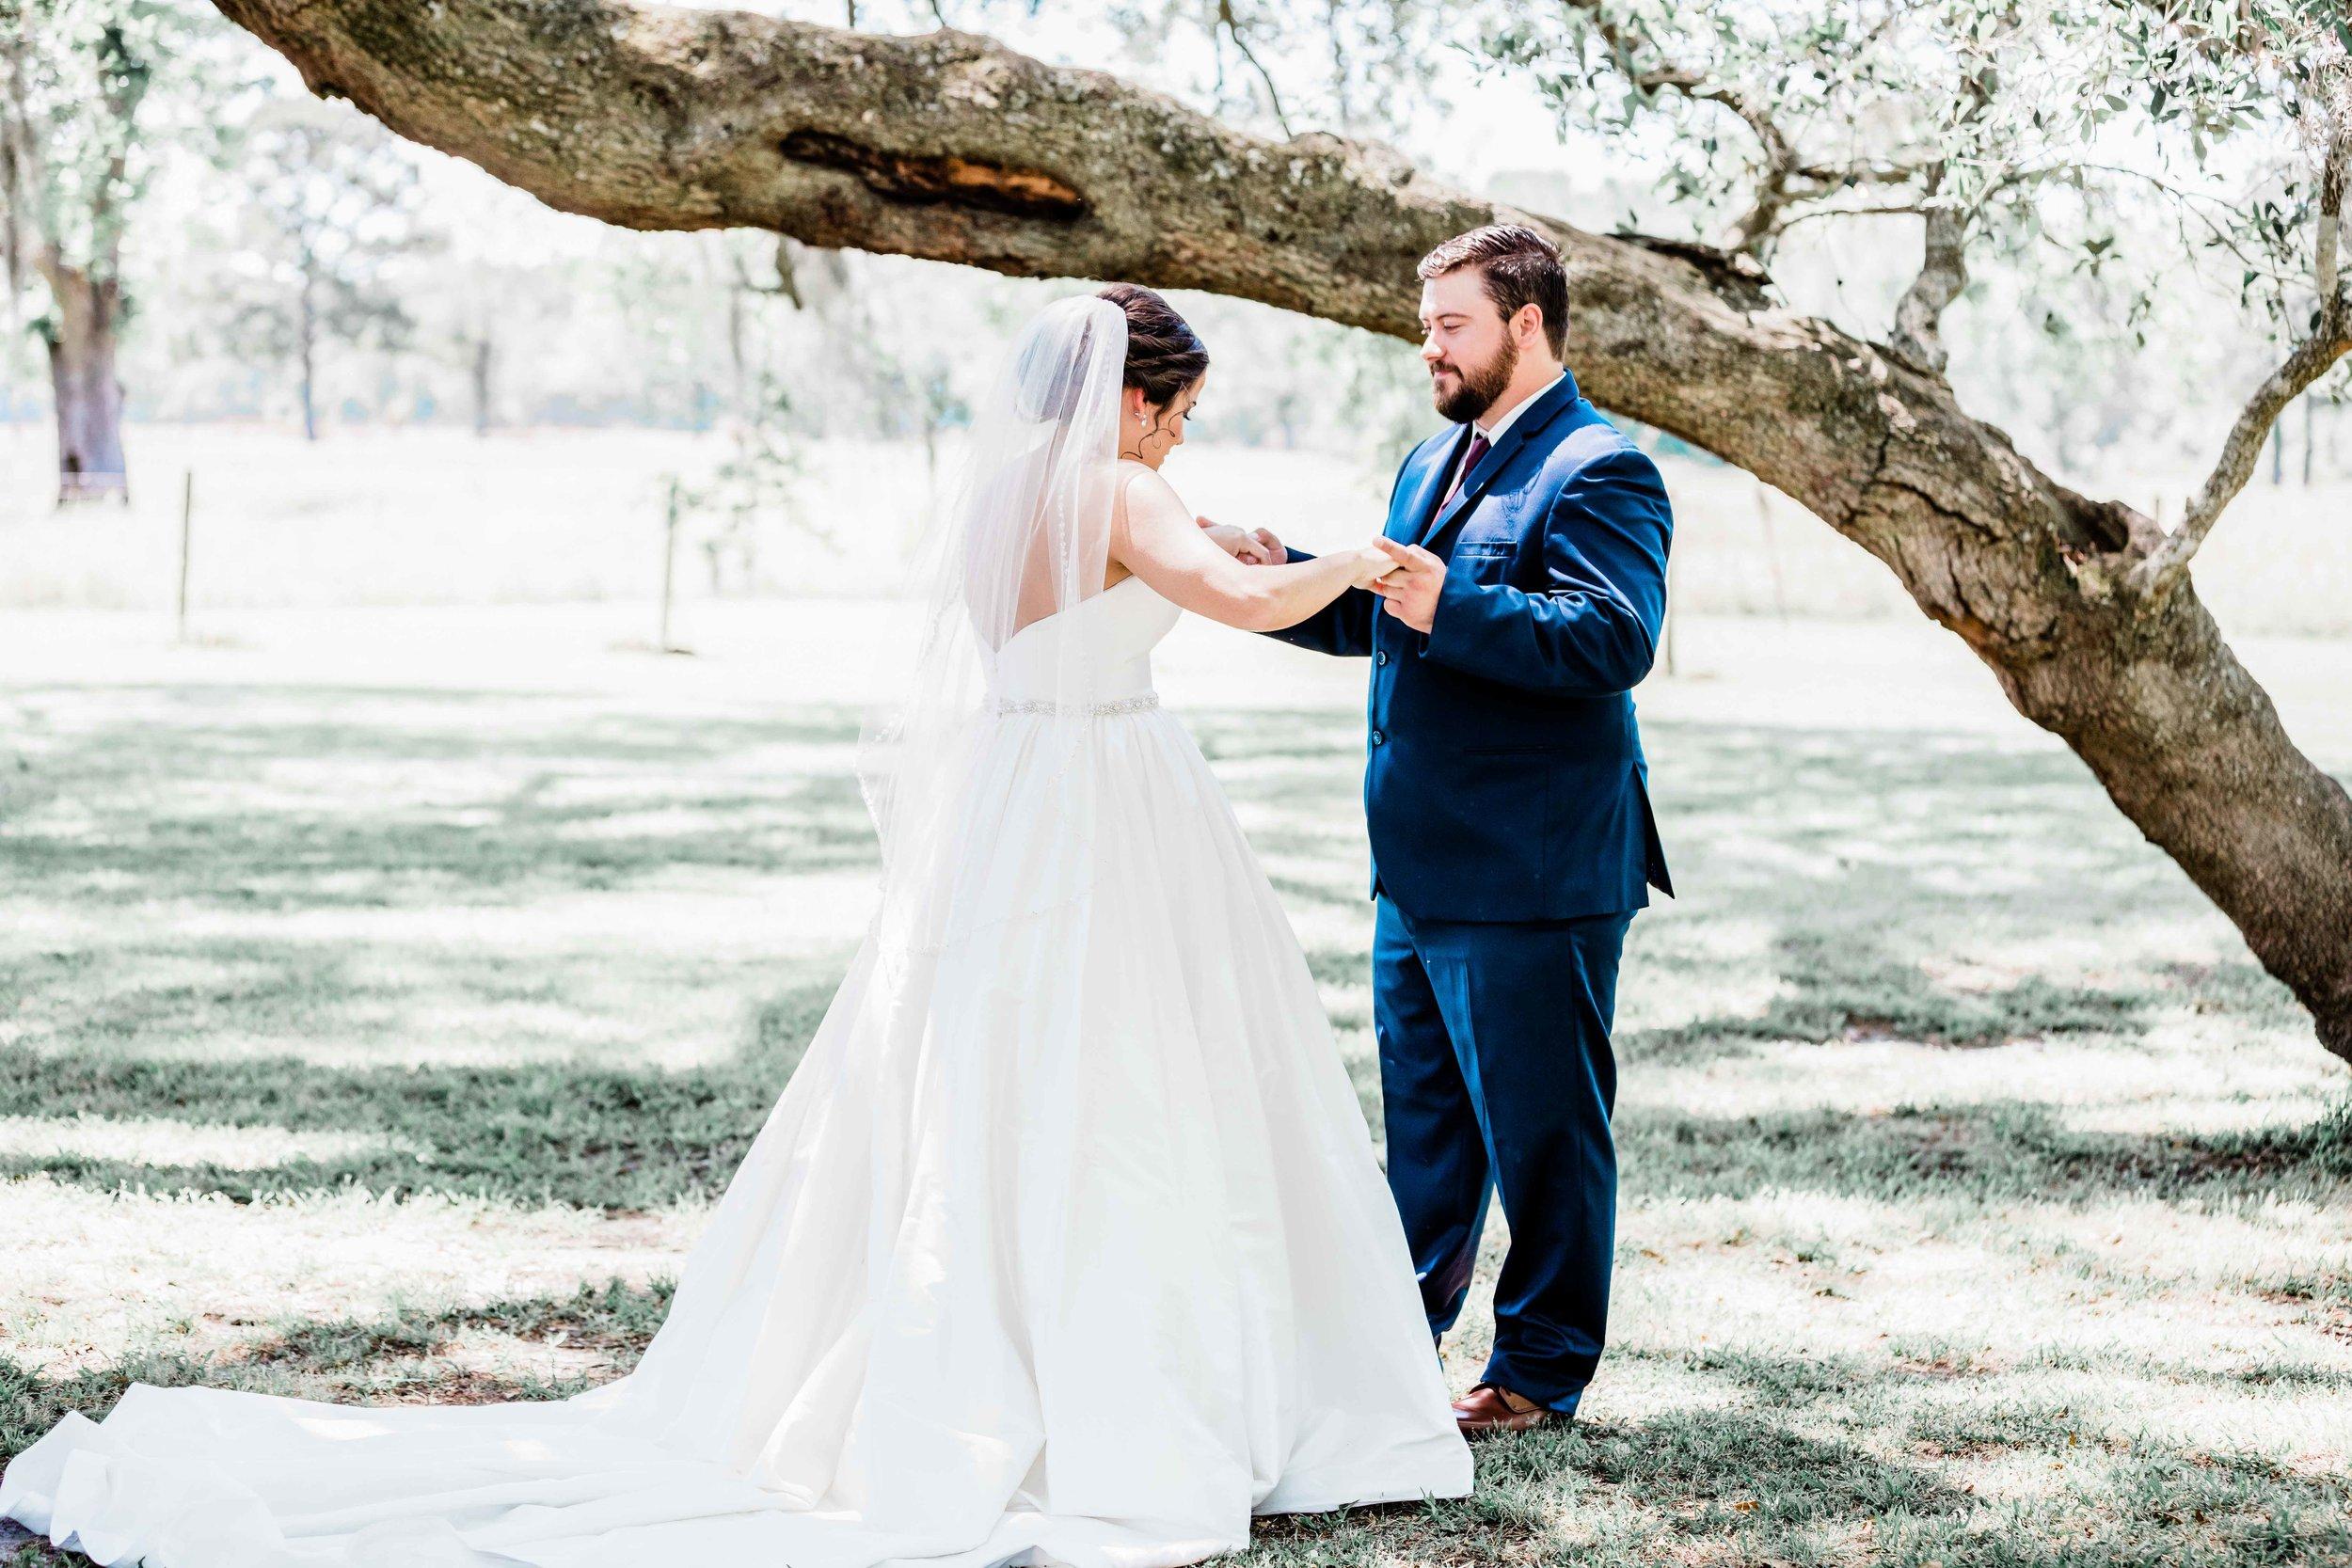 20190427-Southern Lens Photography- Savannah Wedding Photographer-Screven and Caroline-201934.jpg